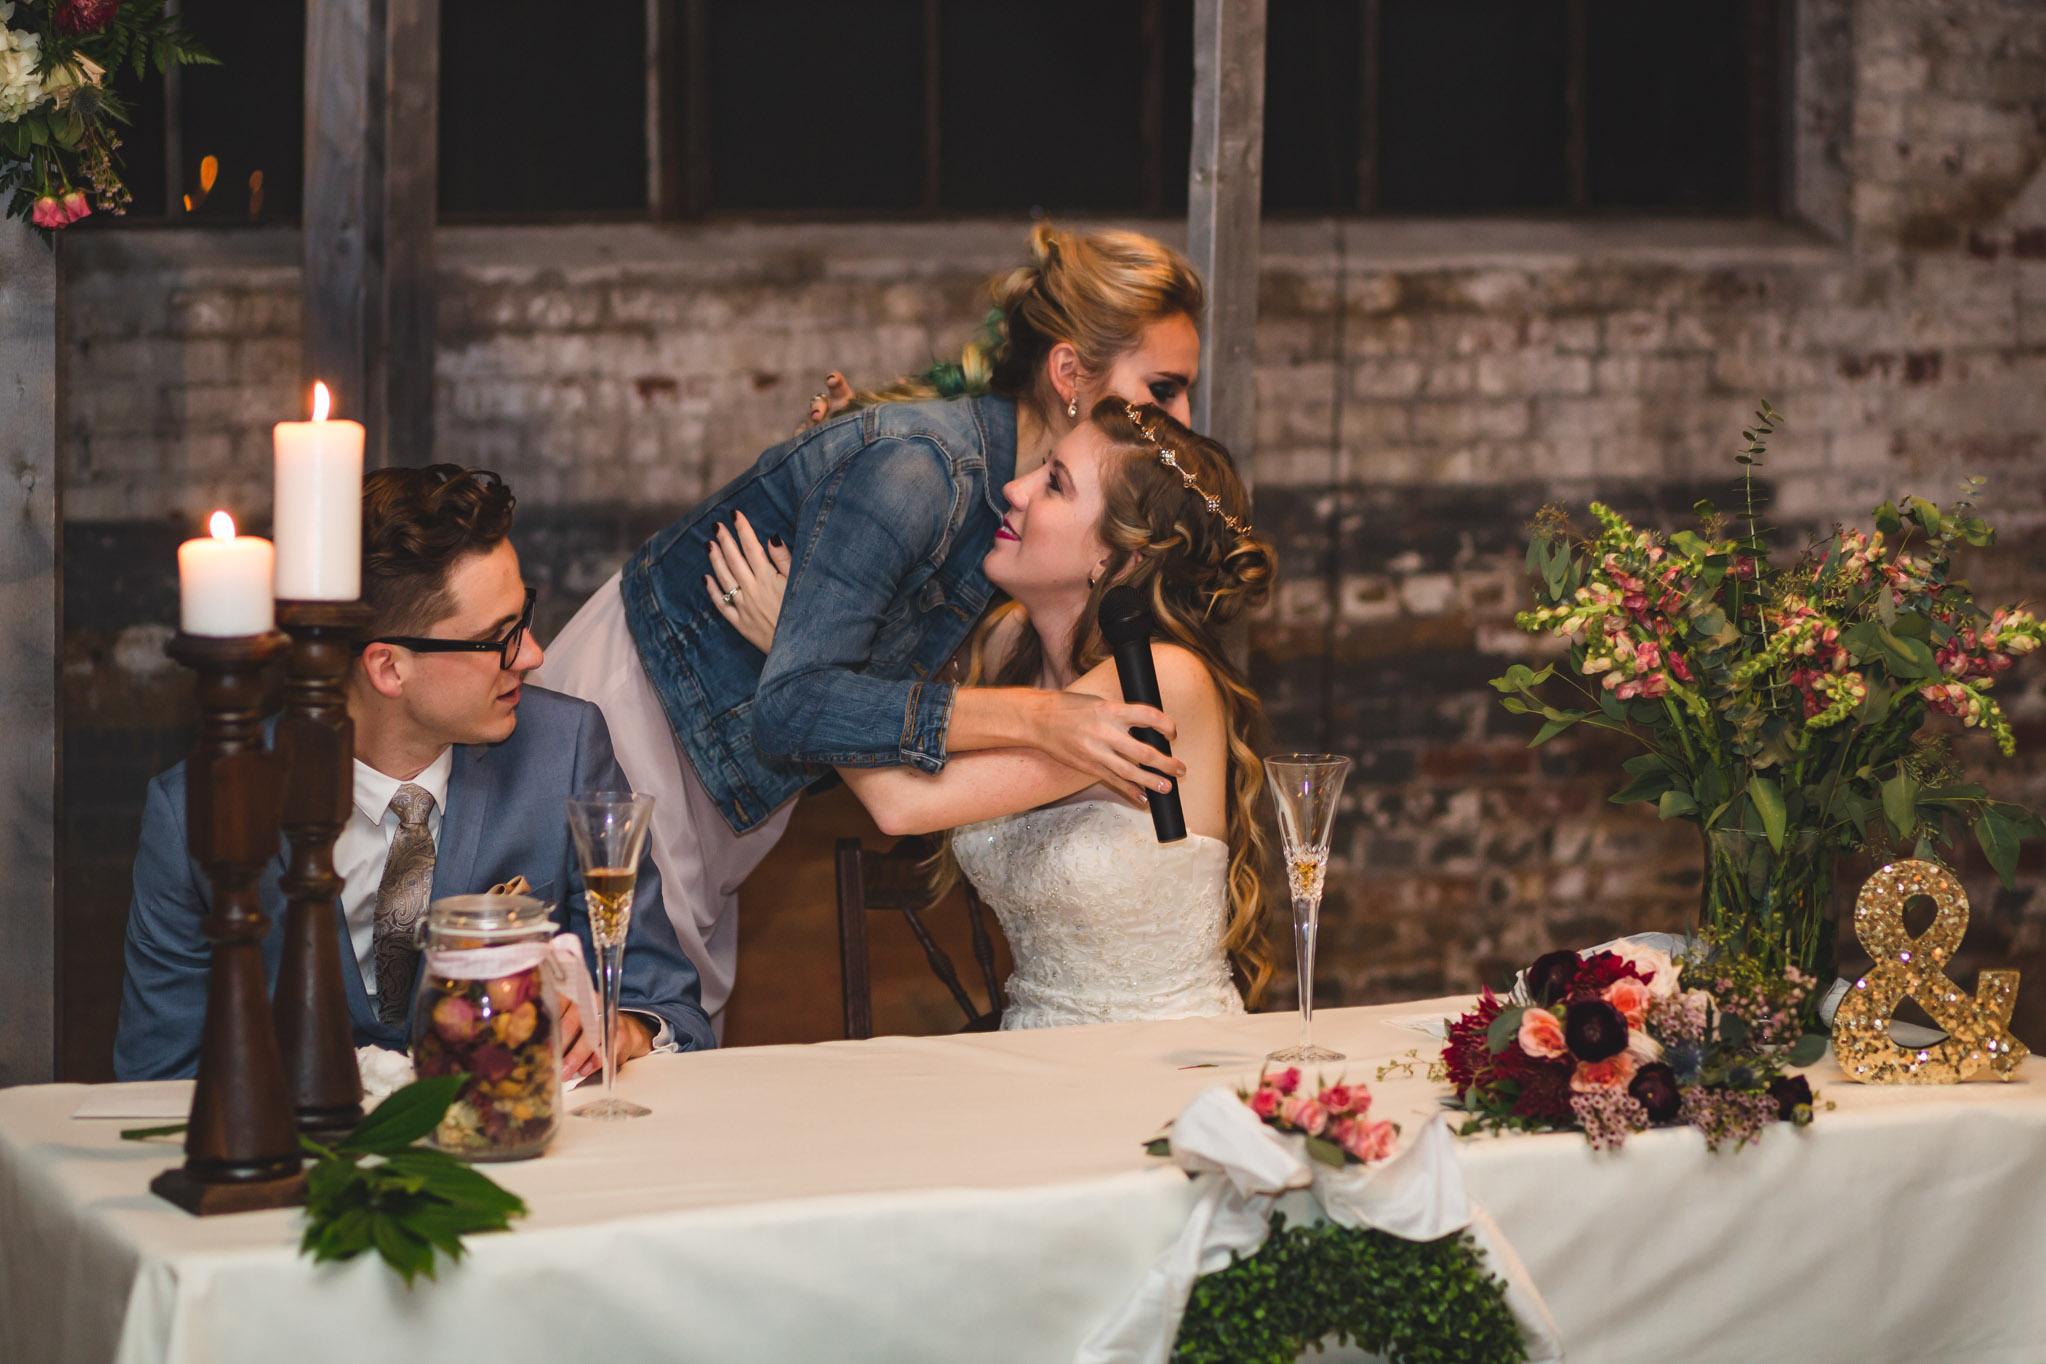 Adam-Szrmack-The-Glass-Factory-Wedding-155.jpg